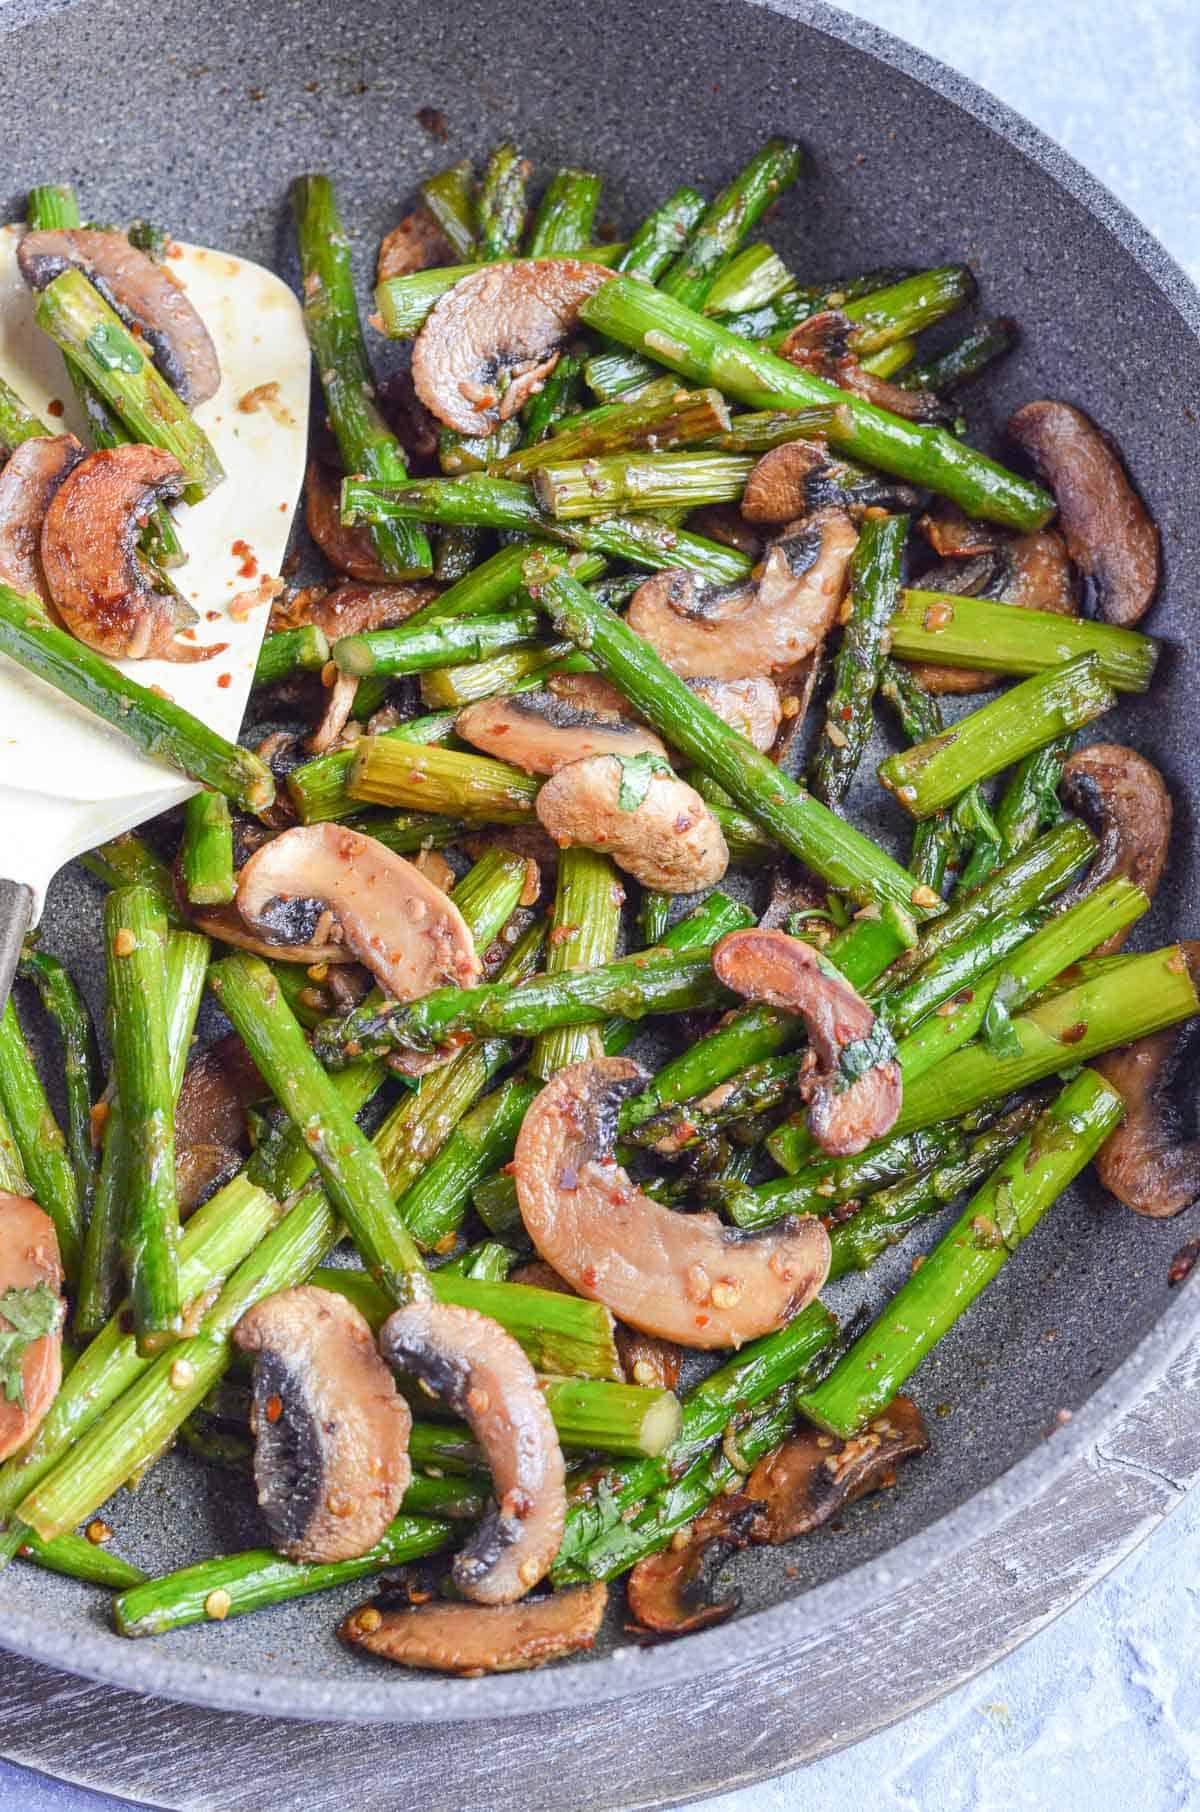 pan-fried mushrooms and asparagus